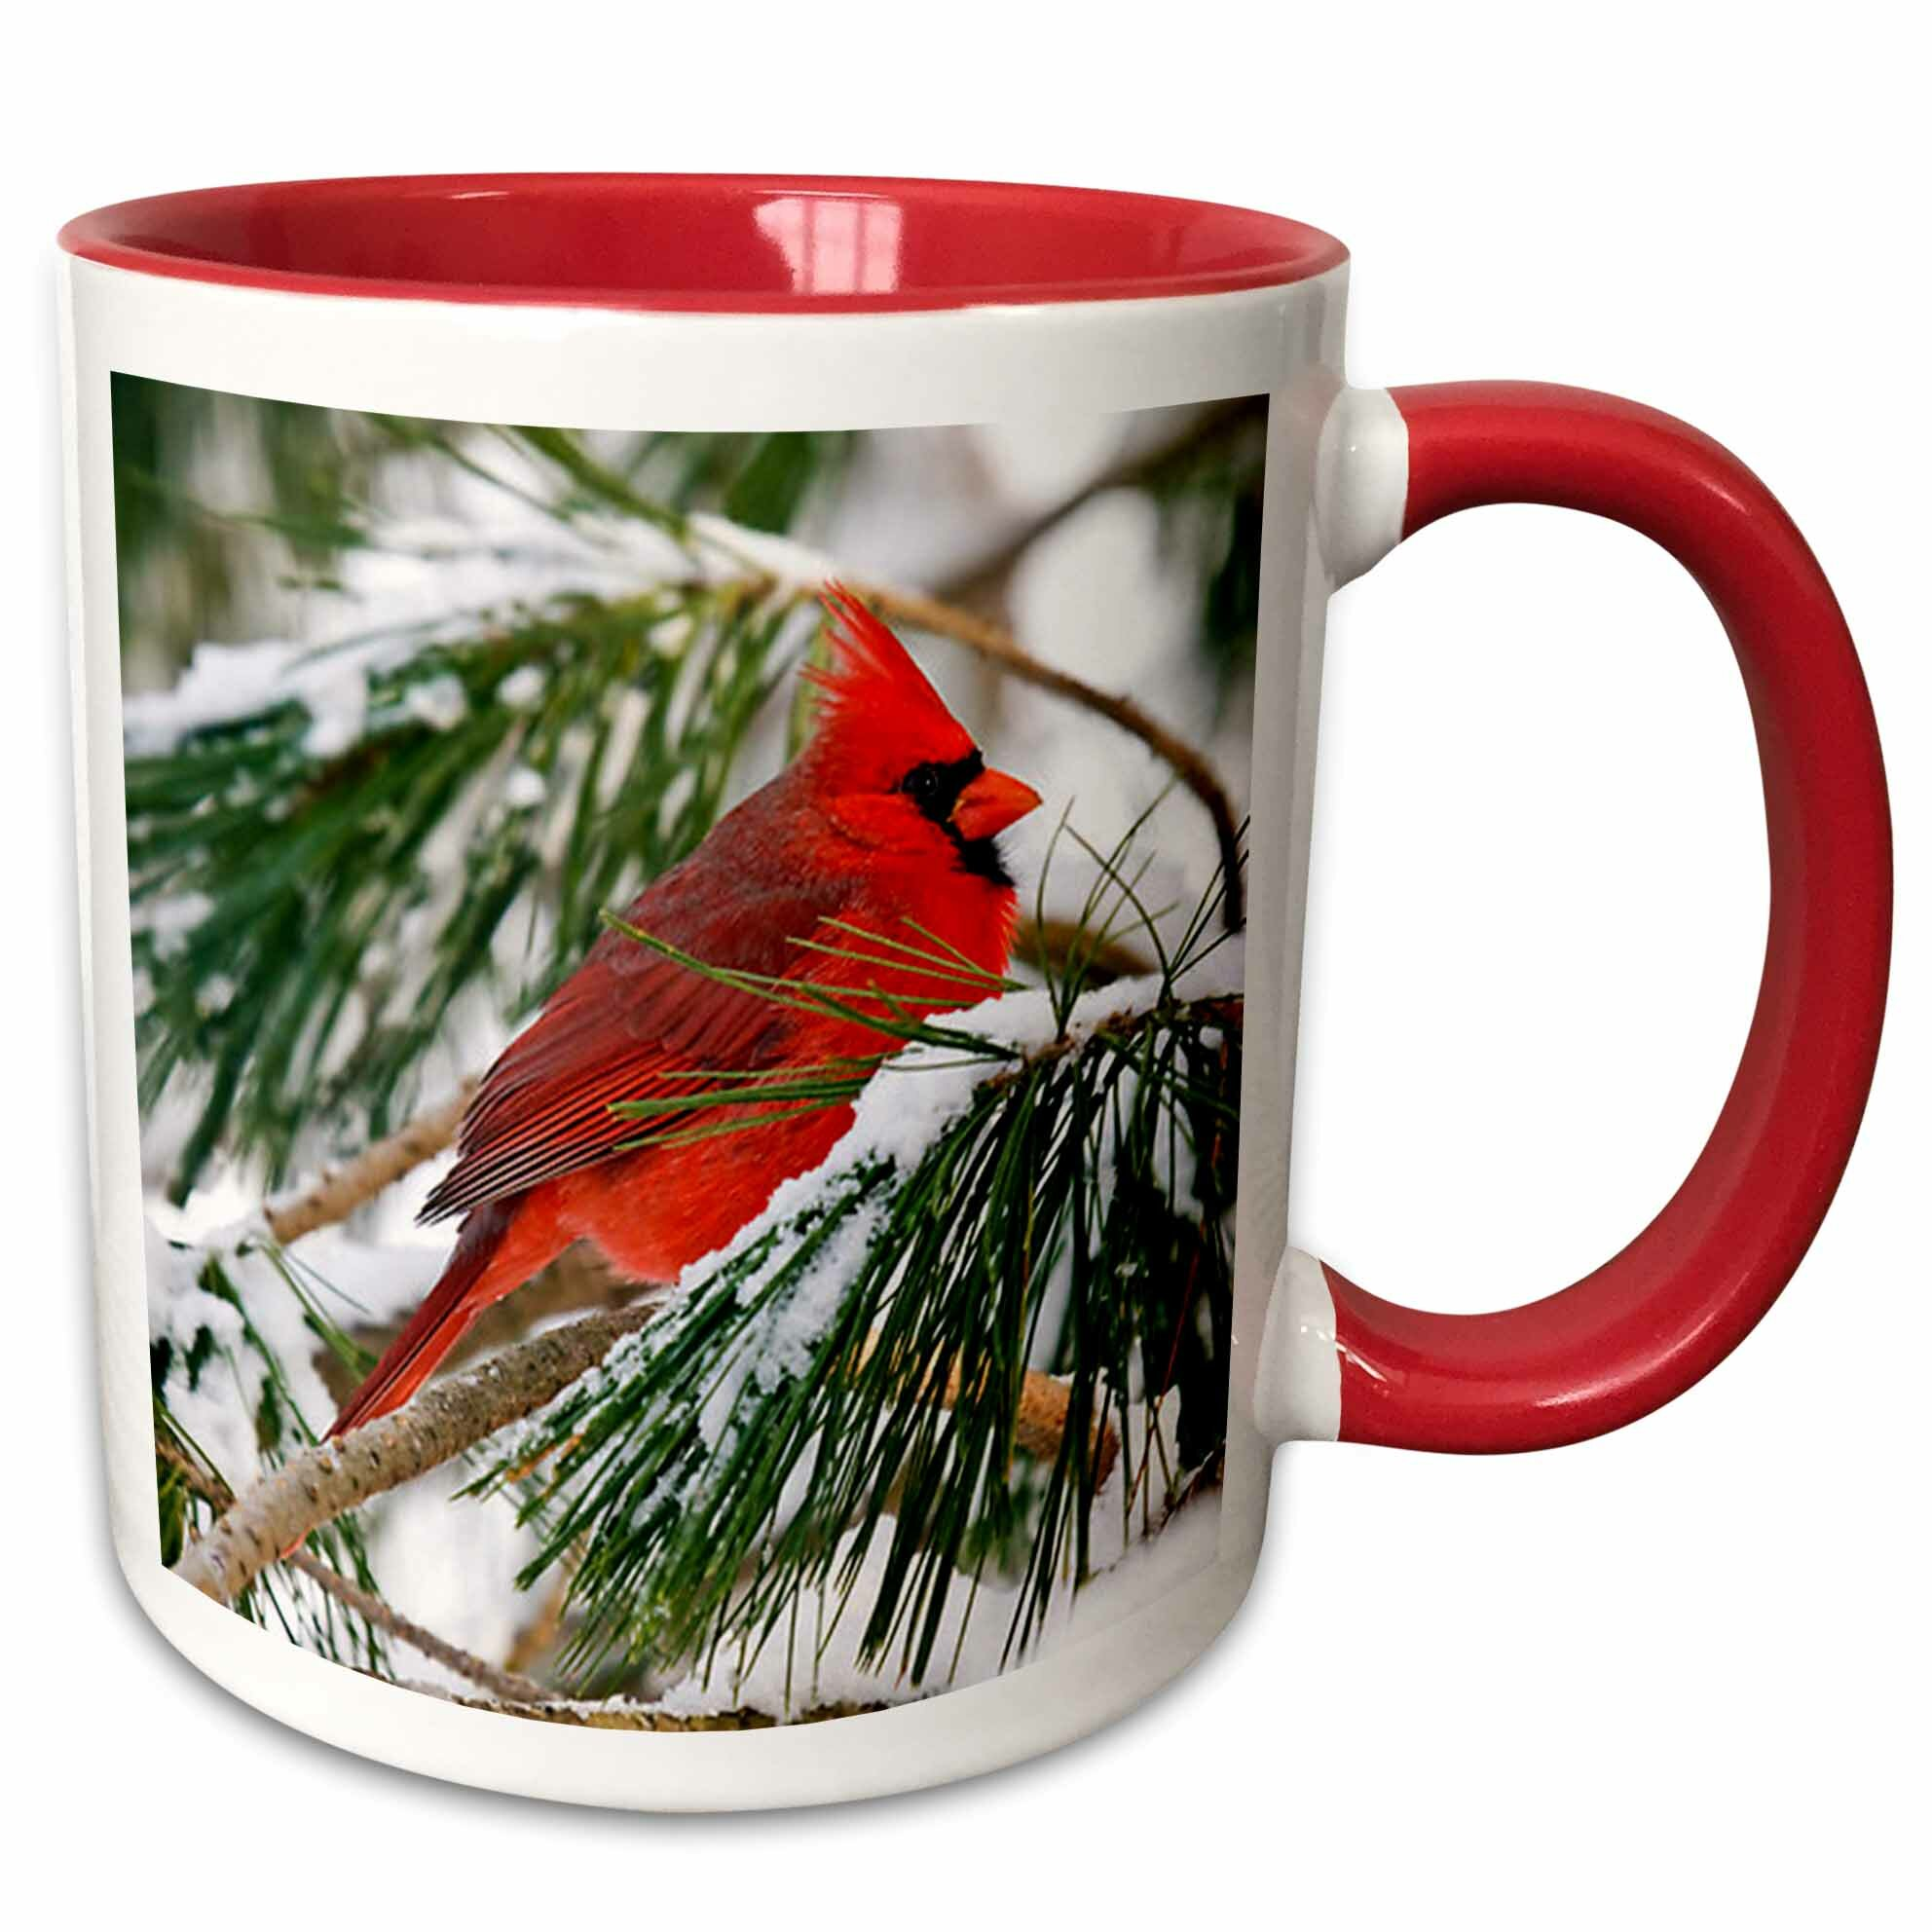 The Holiday Aisle Oehler Cardinal Perched In Snowy Pine Tree Coffee Mug Wayfair